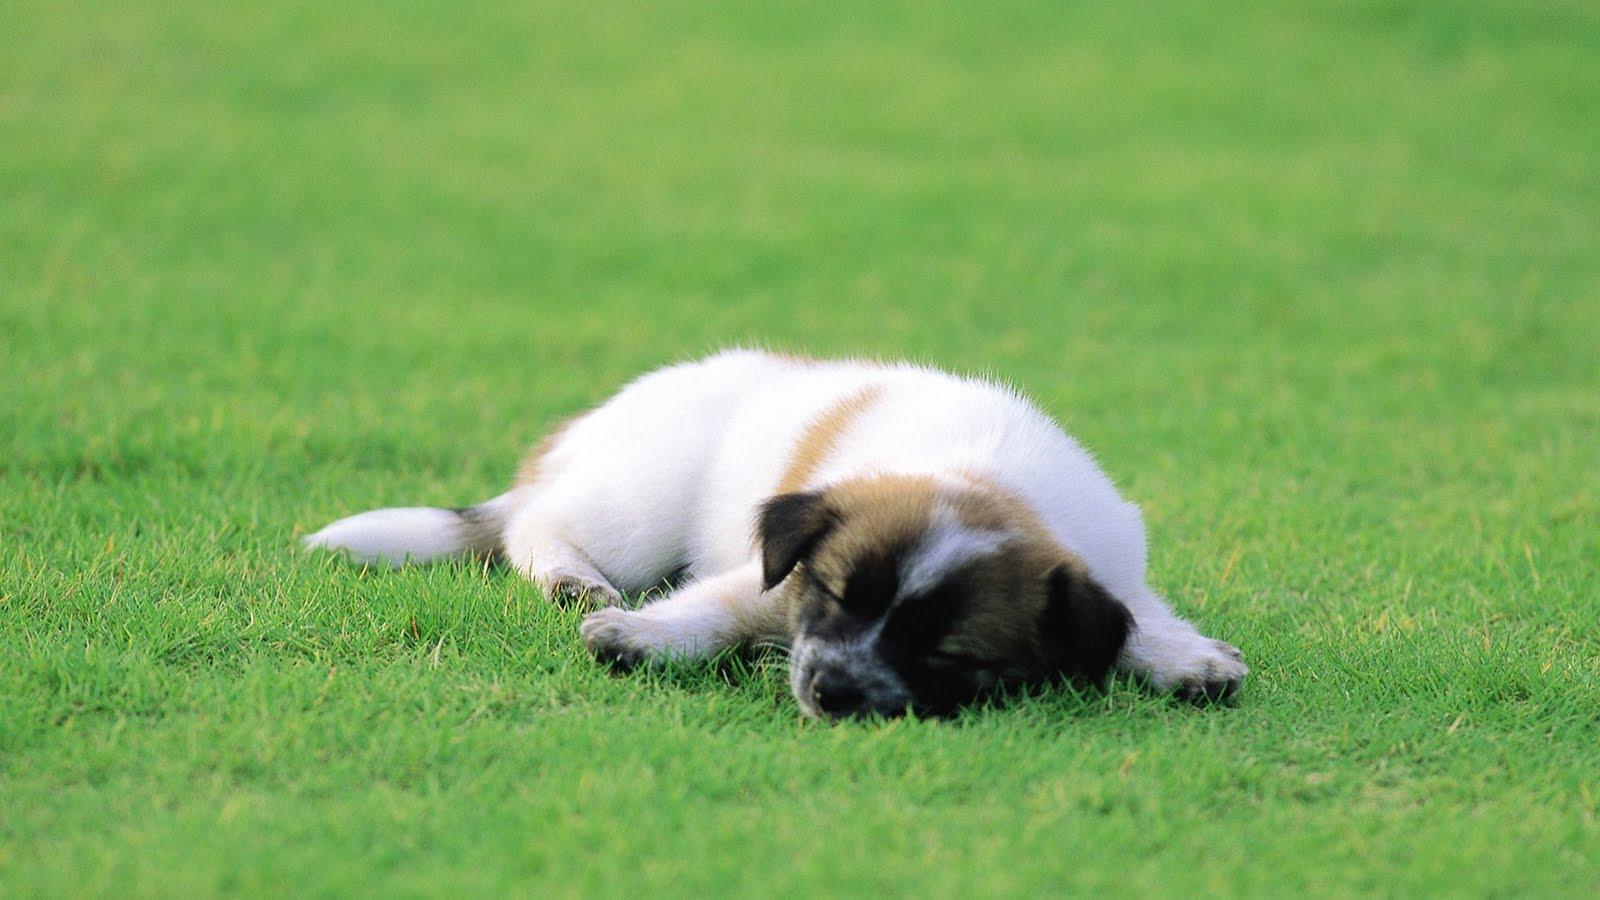 download wallpaper dog little - photo #21